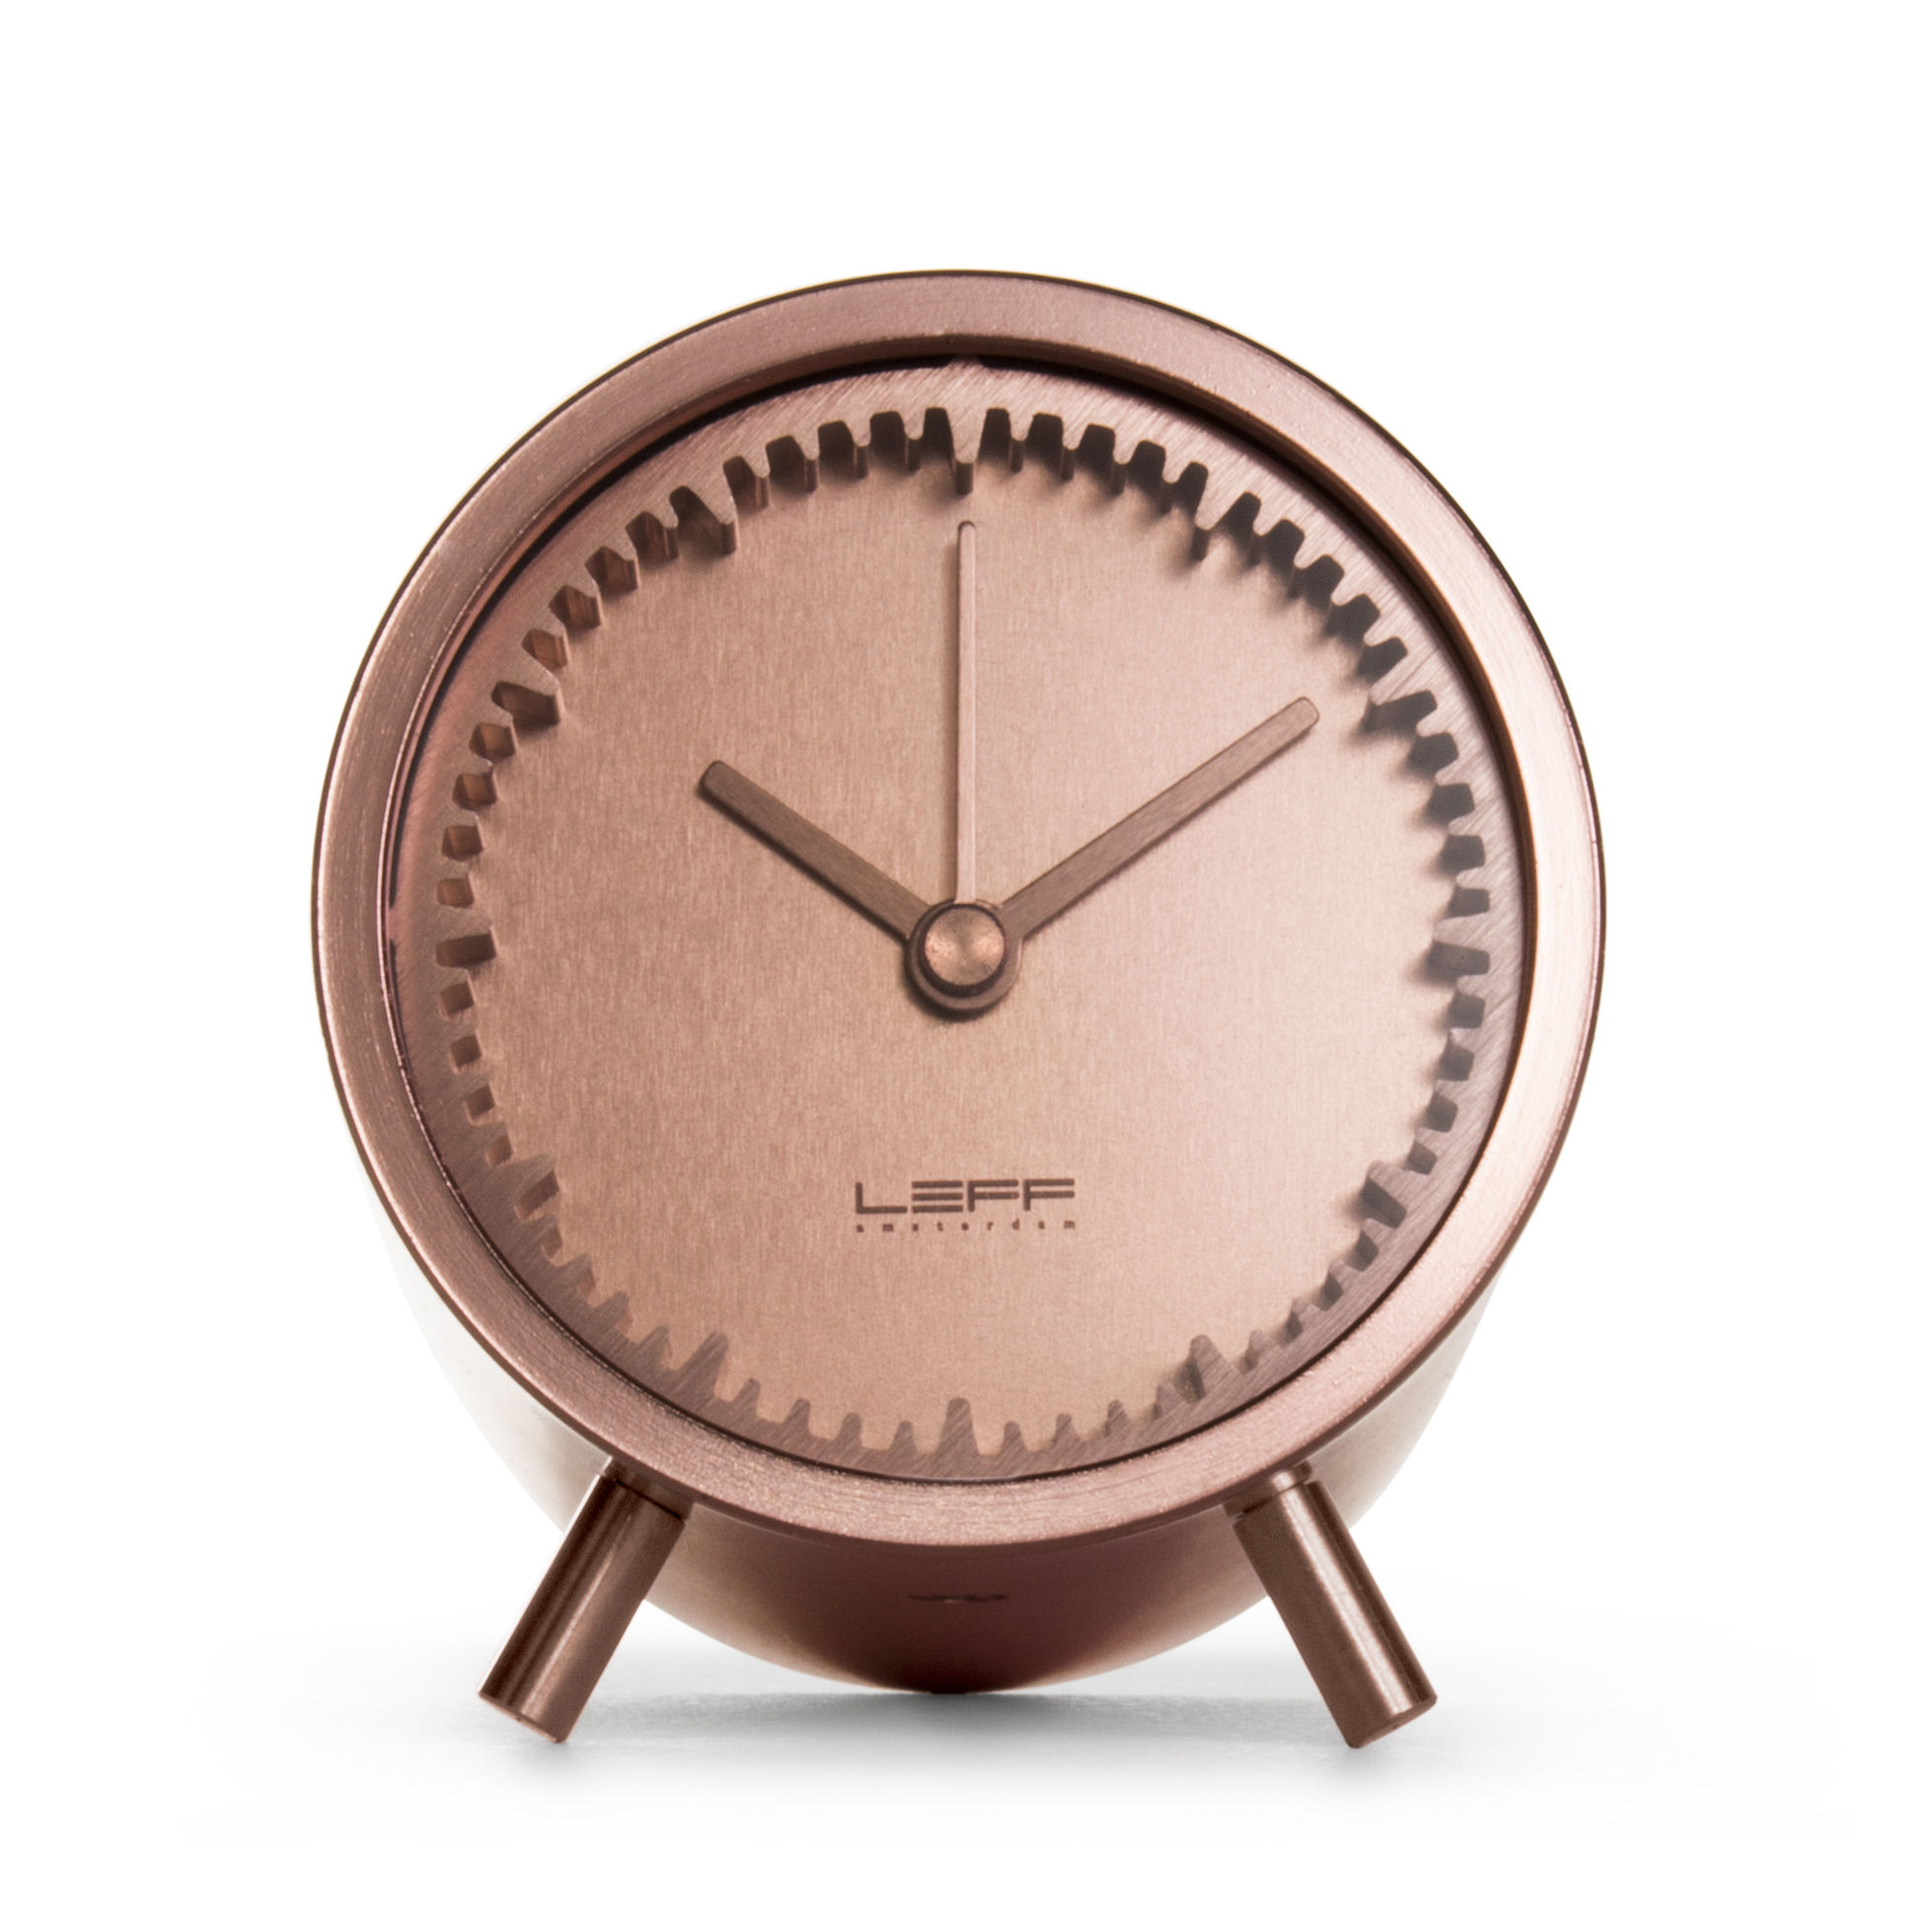 Horloge poser tube 5 cm cuivre leff amsterdam - Horloge a poser design ...